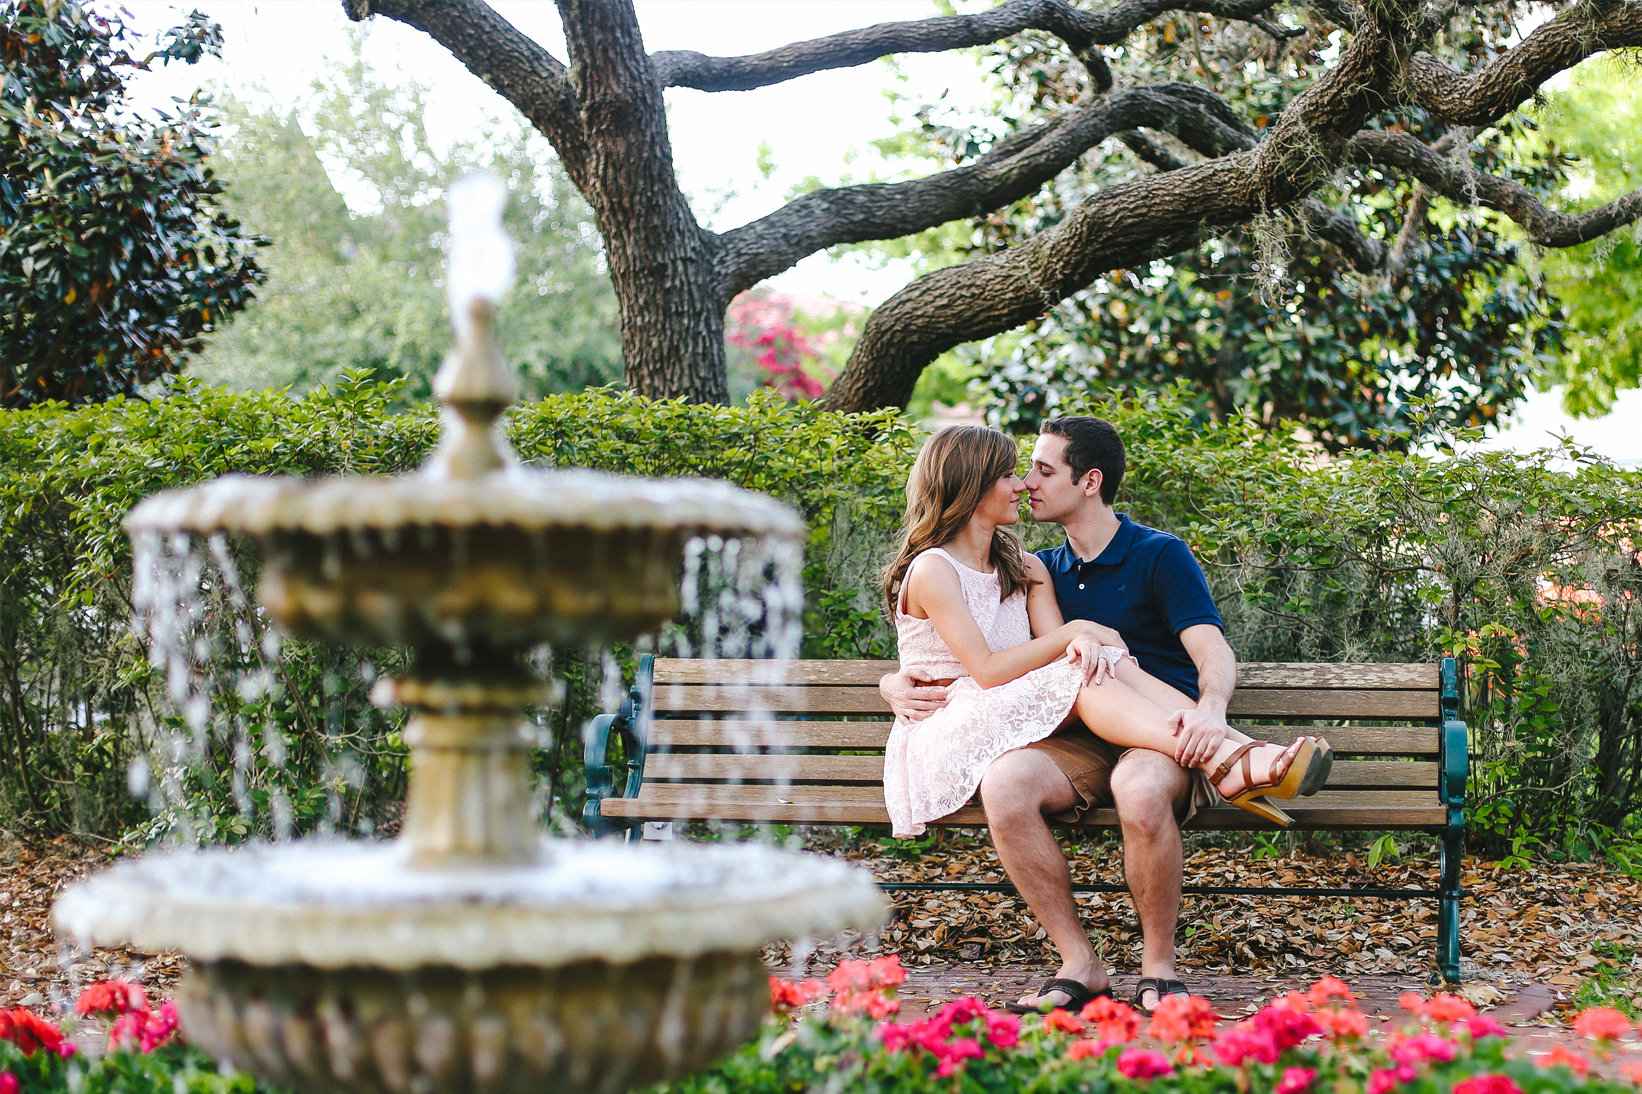 Krista Lajara Photography | www.kristalajara.com | Florida Couple Session